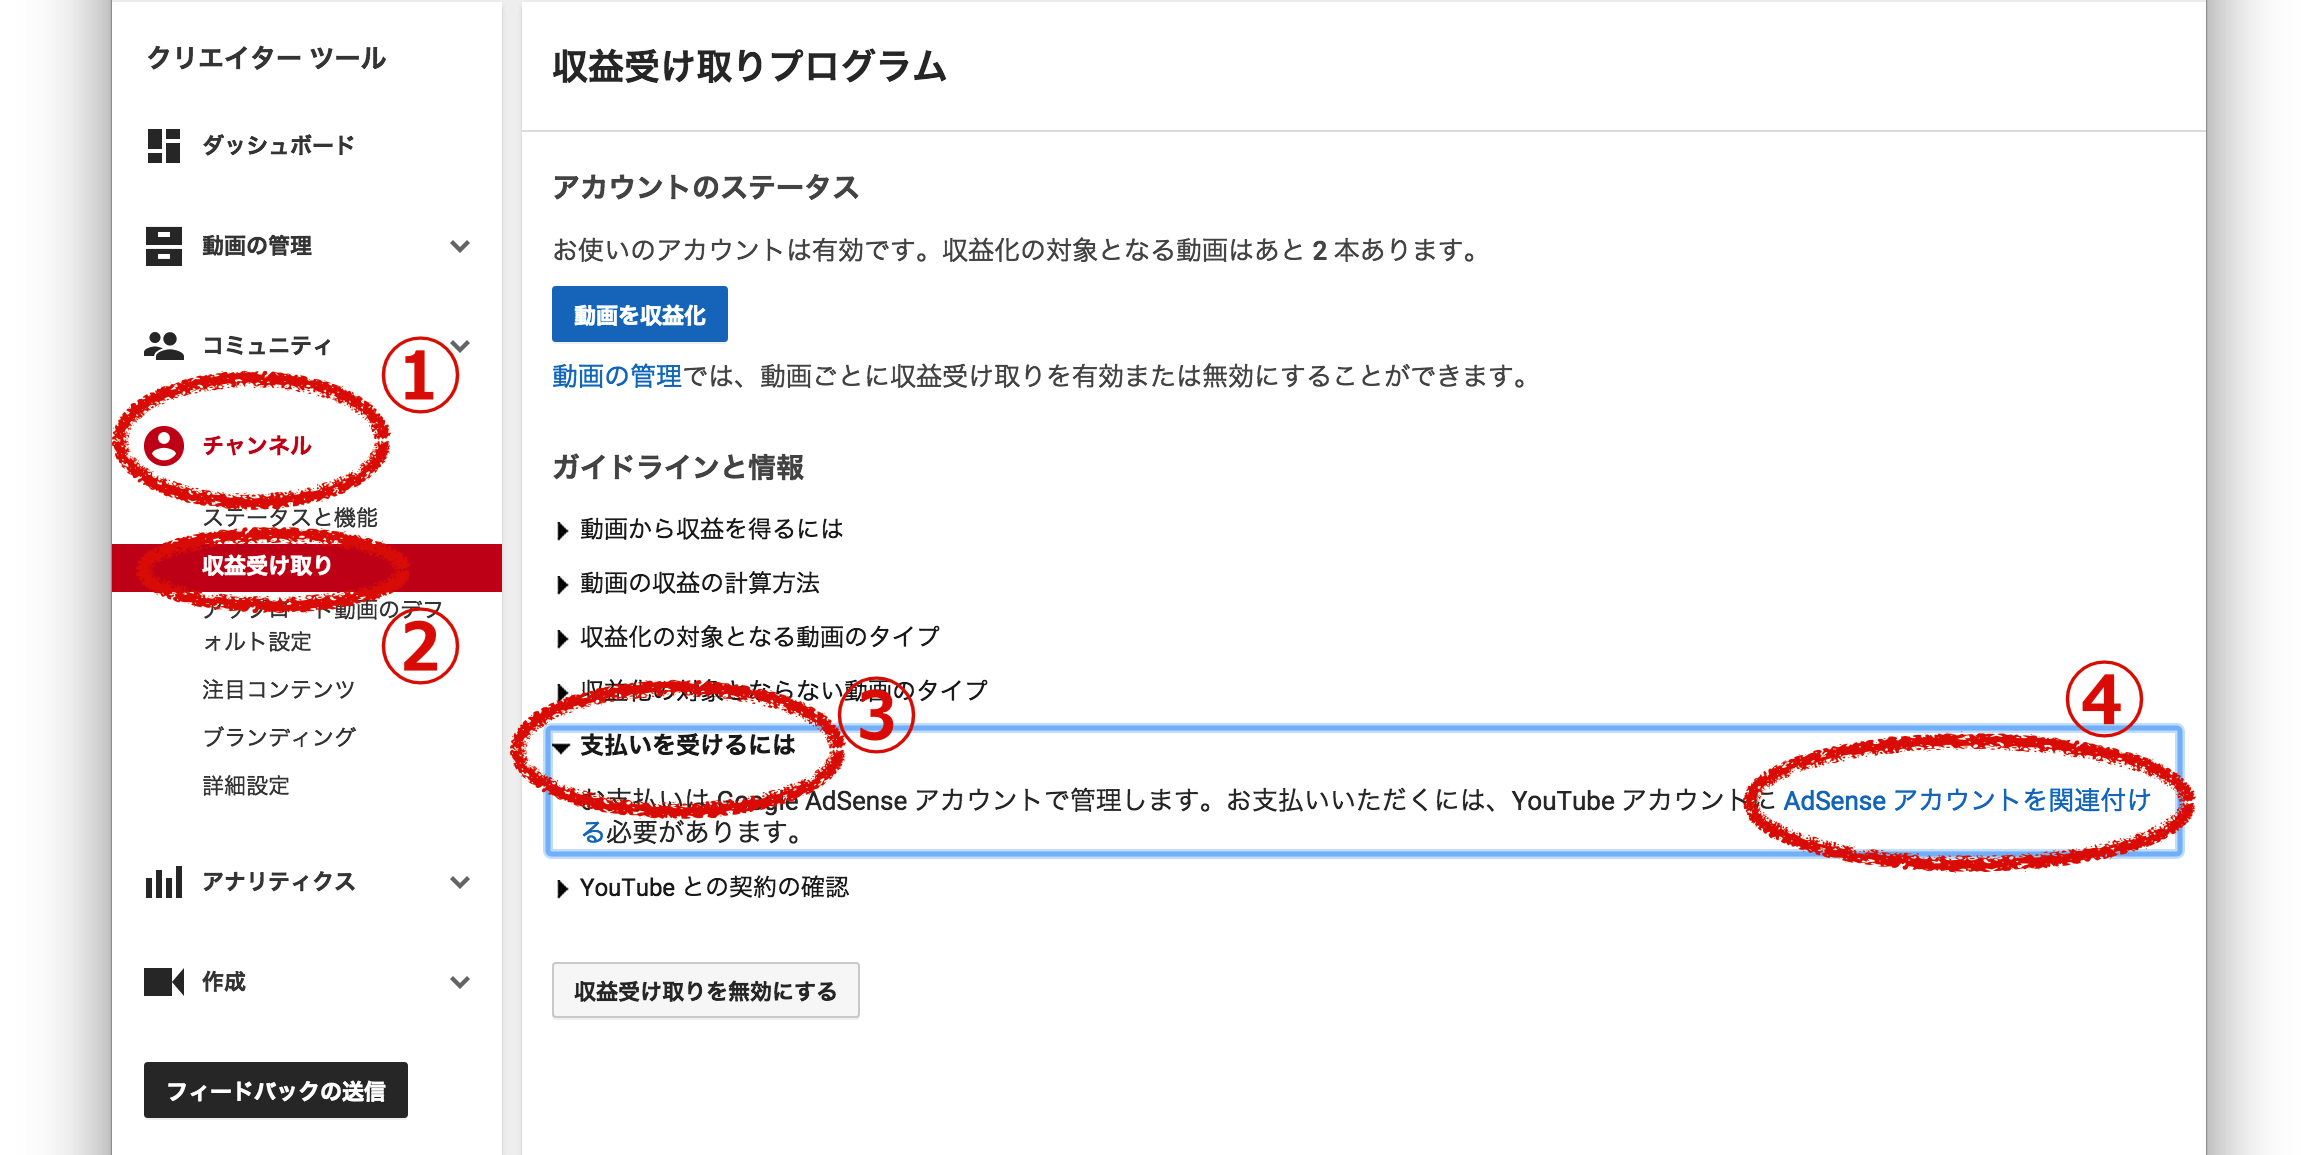 YouTube収益受け取りAdSense設定 1